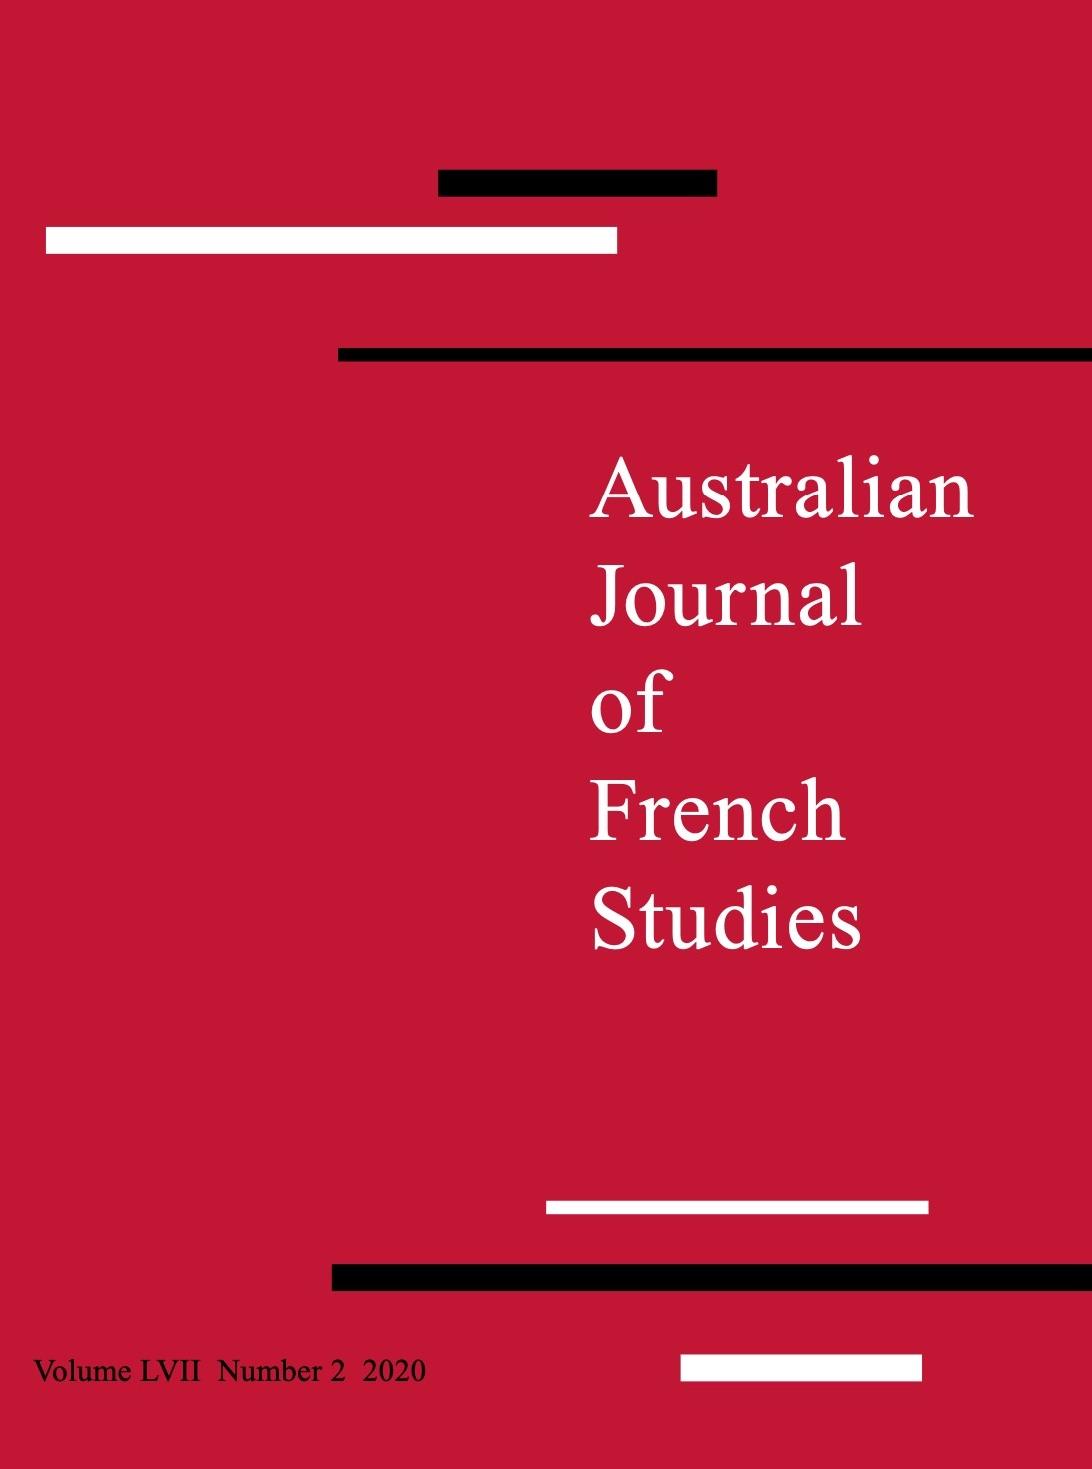 Australian Journal of French Studies, vol. 57, 2020